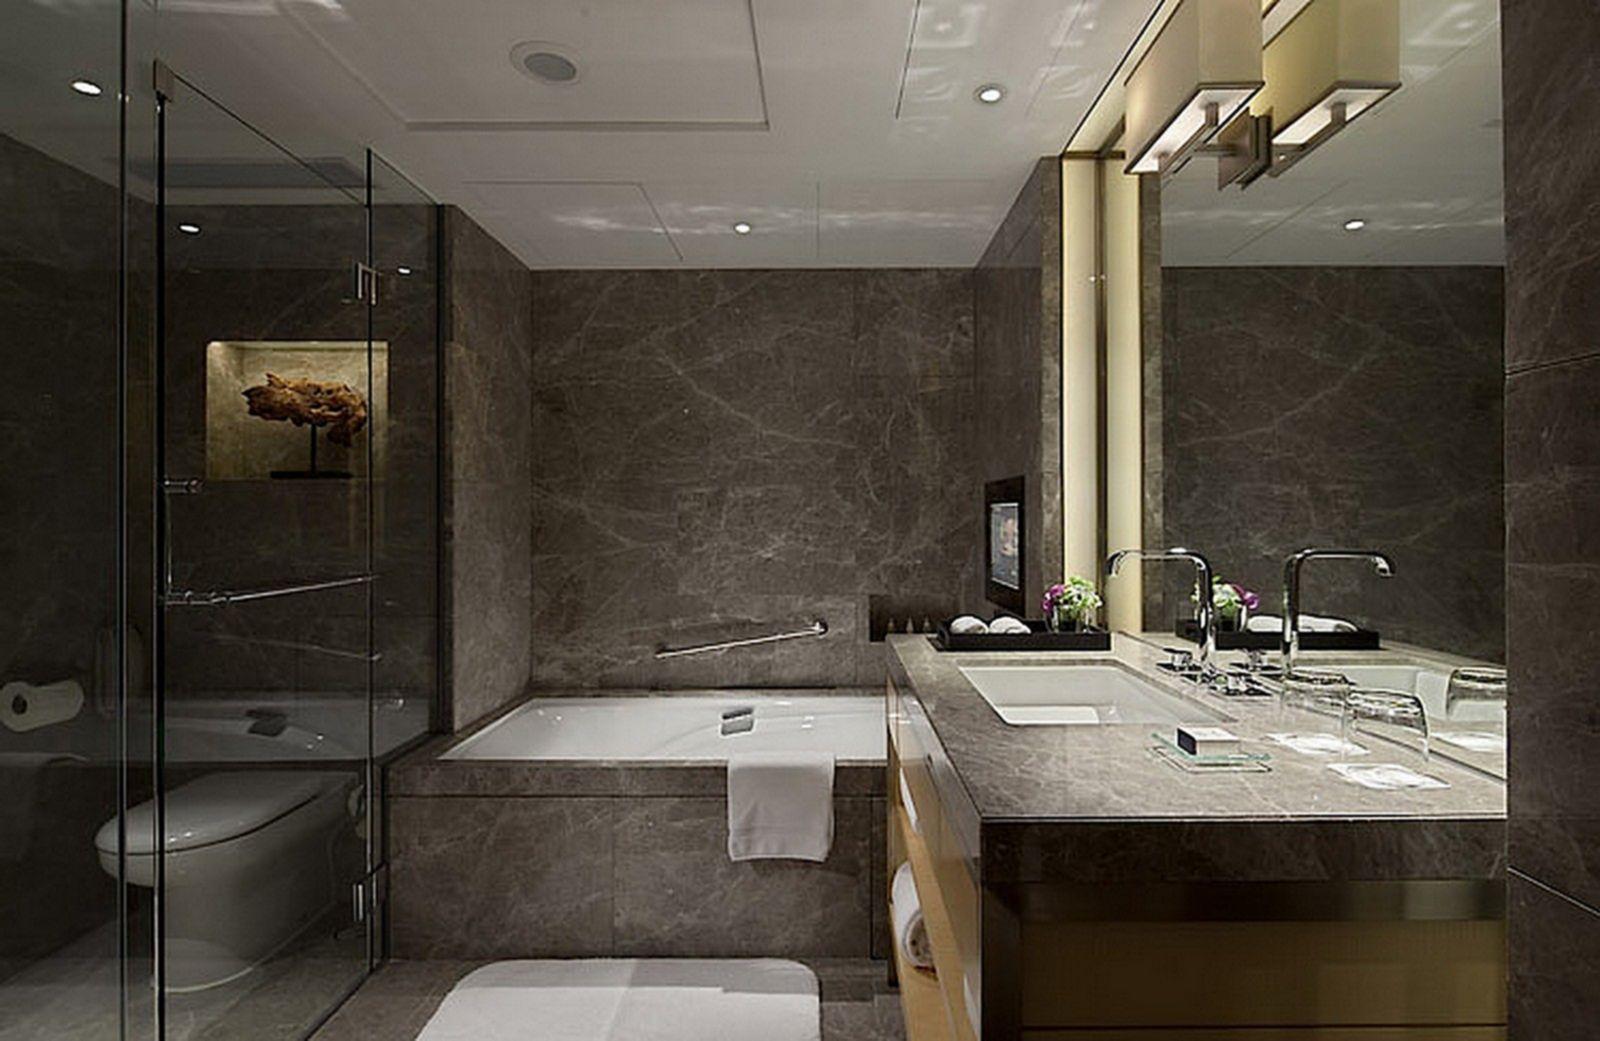 Brilliant Best 20 Bathroom Design Ideas Like 5 Stars Hotel Https Hroomy Com Bathroom Best 20 Ba Hotel Bathroom Design Bathroom Design Modern Luxury Bathroom